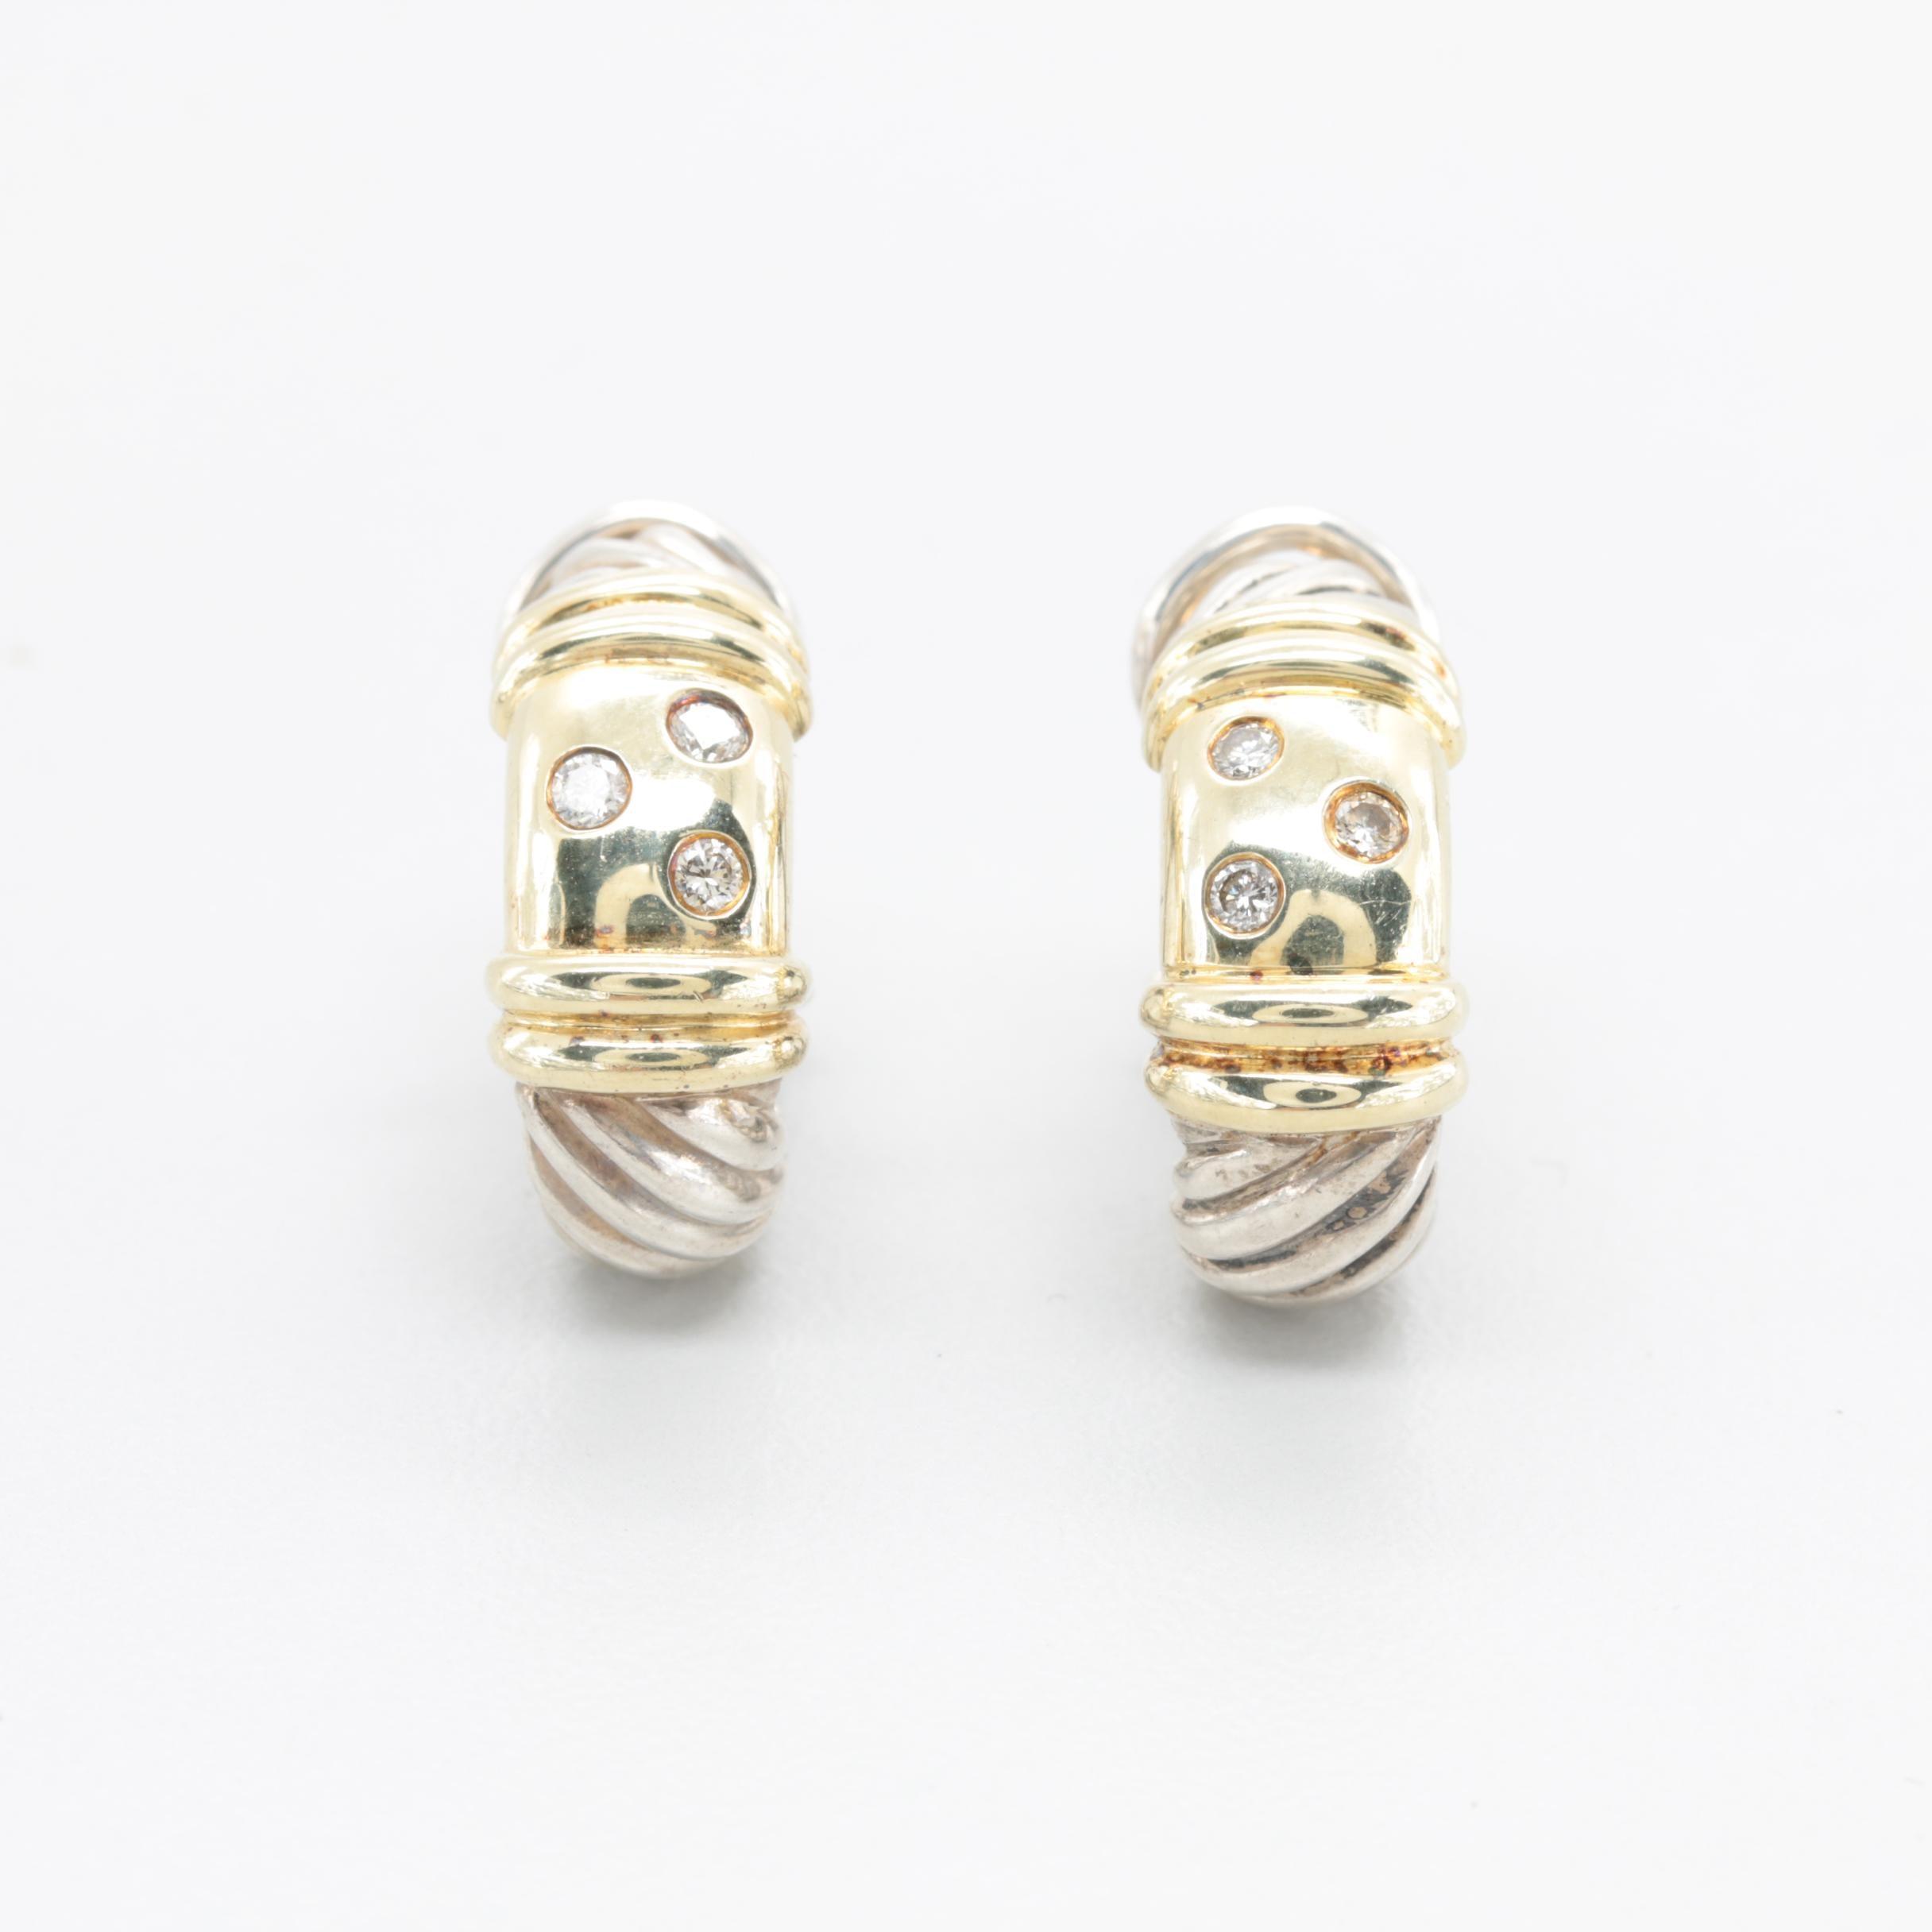 David Yurman Sterling Silver and 14K Yellow Gold Diamond Earrings